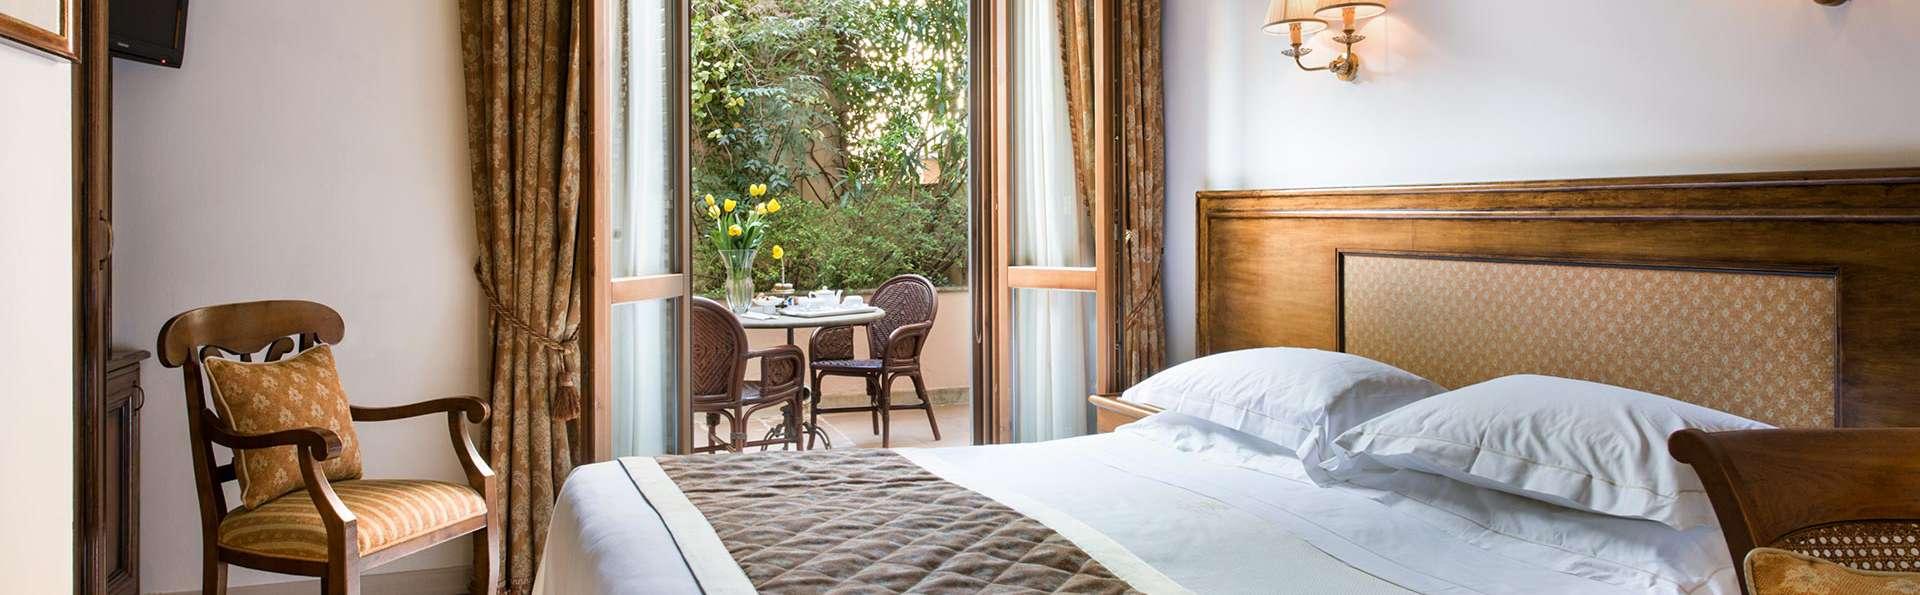 Hotel Adler Cavalieri - EDIT_room2.jpg